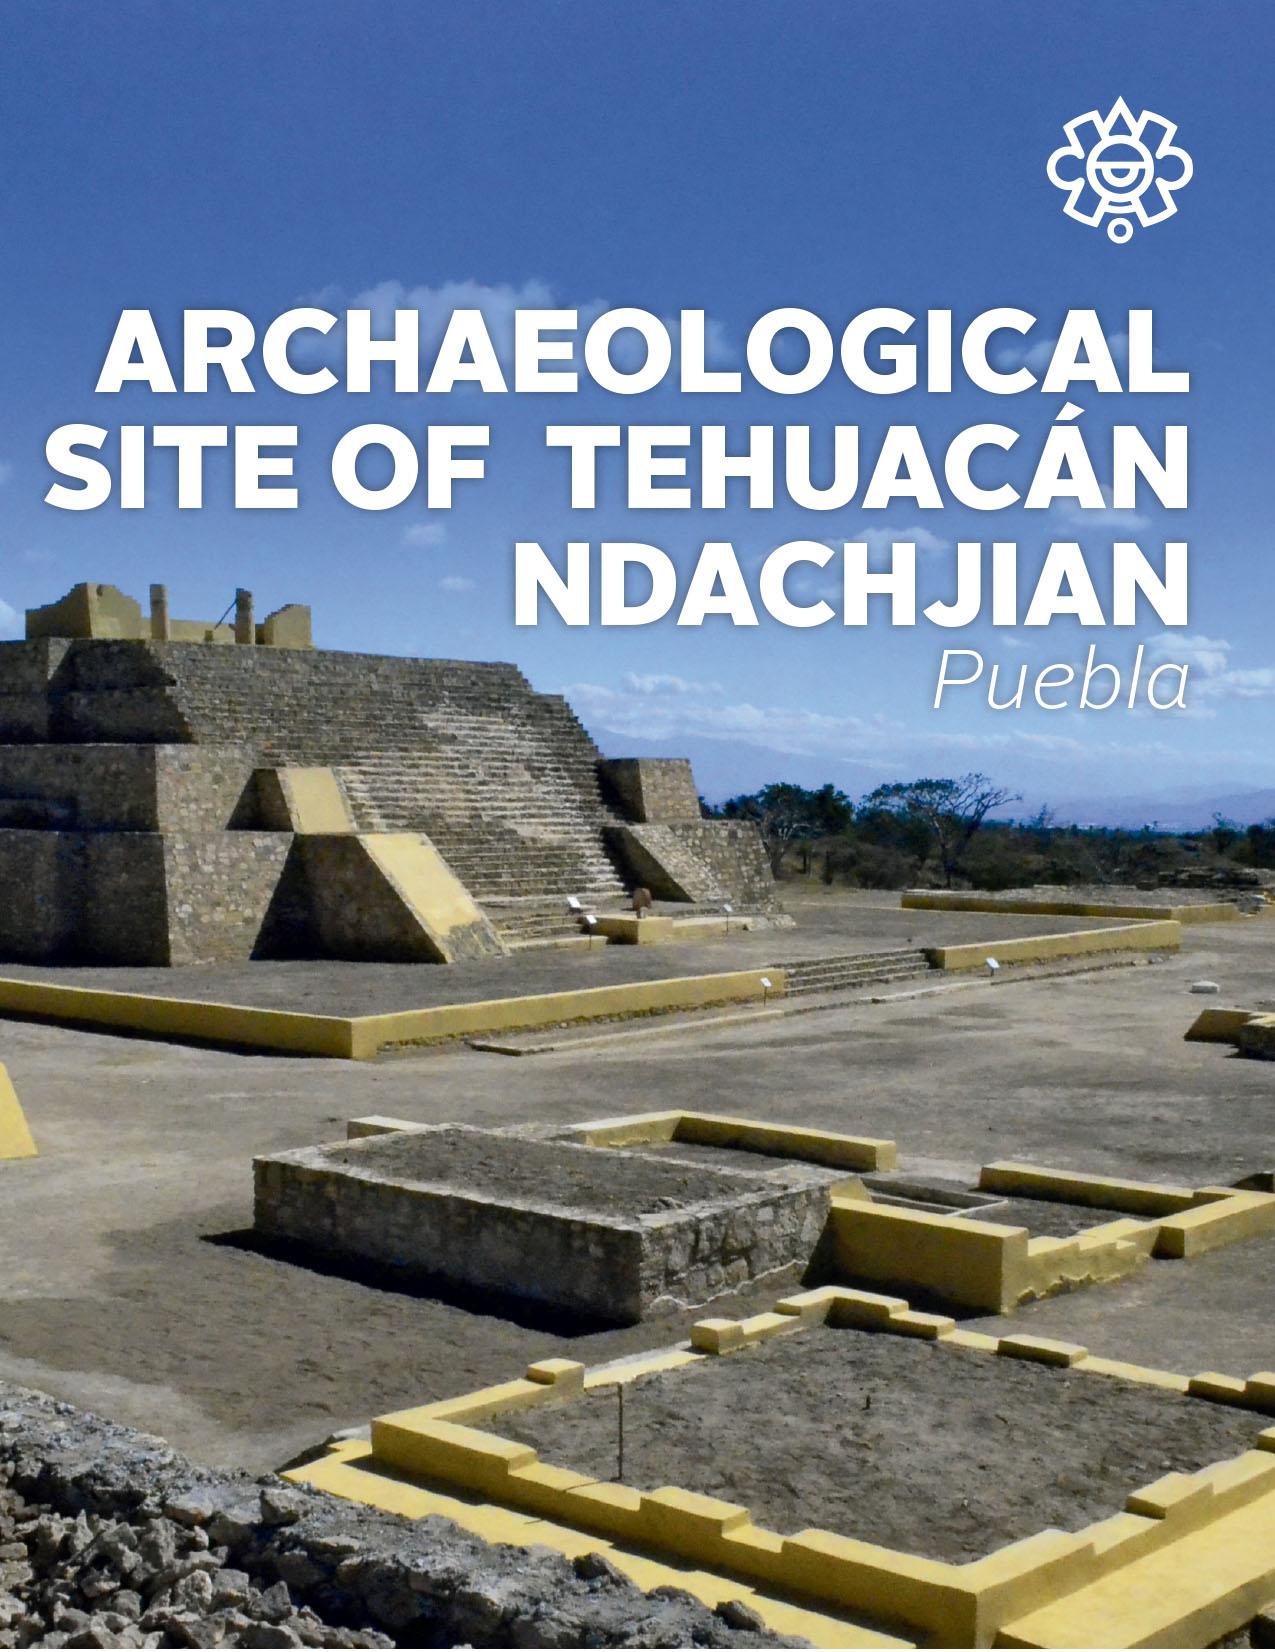 Archaeological Site of Tehuacán Ndachjian